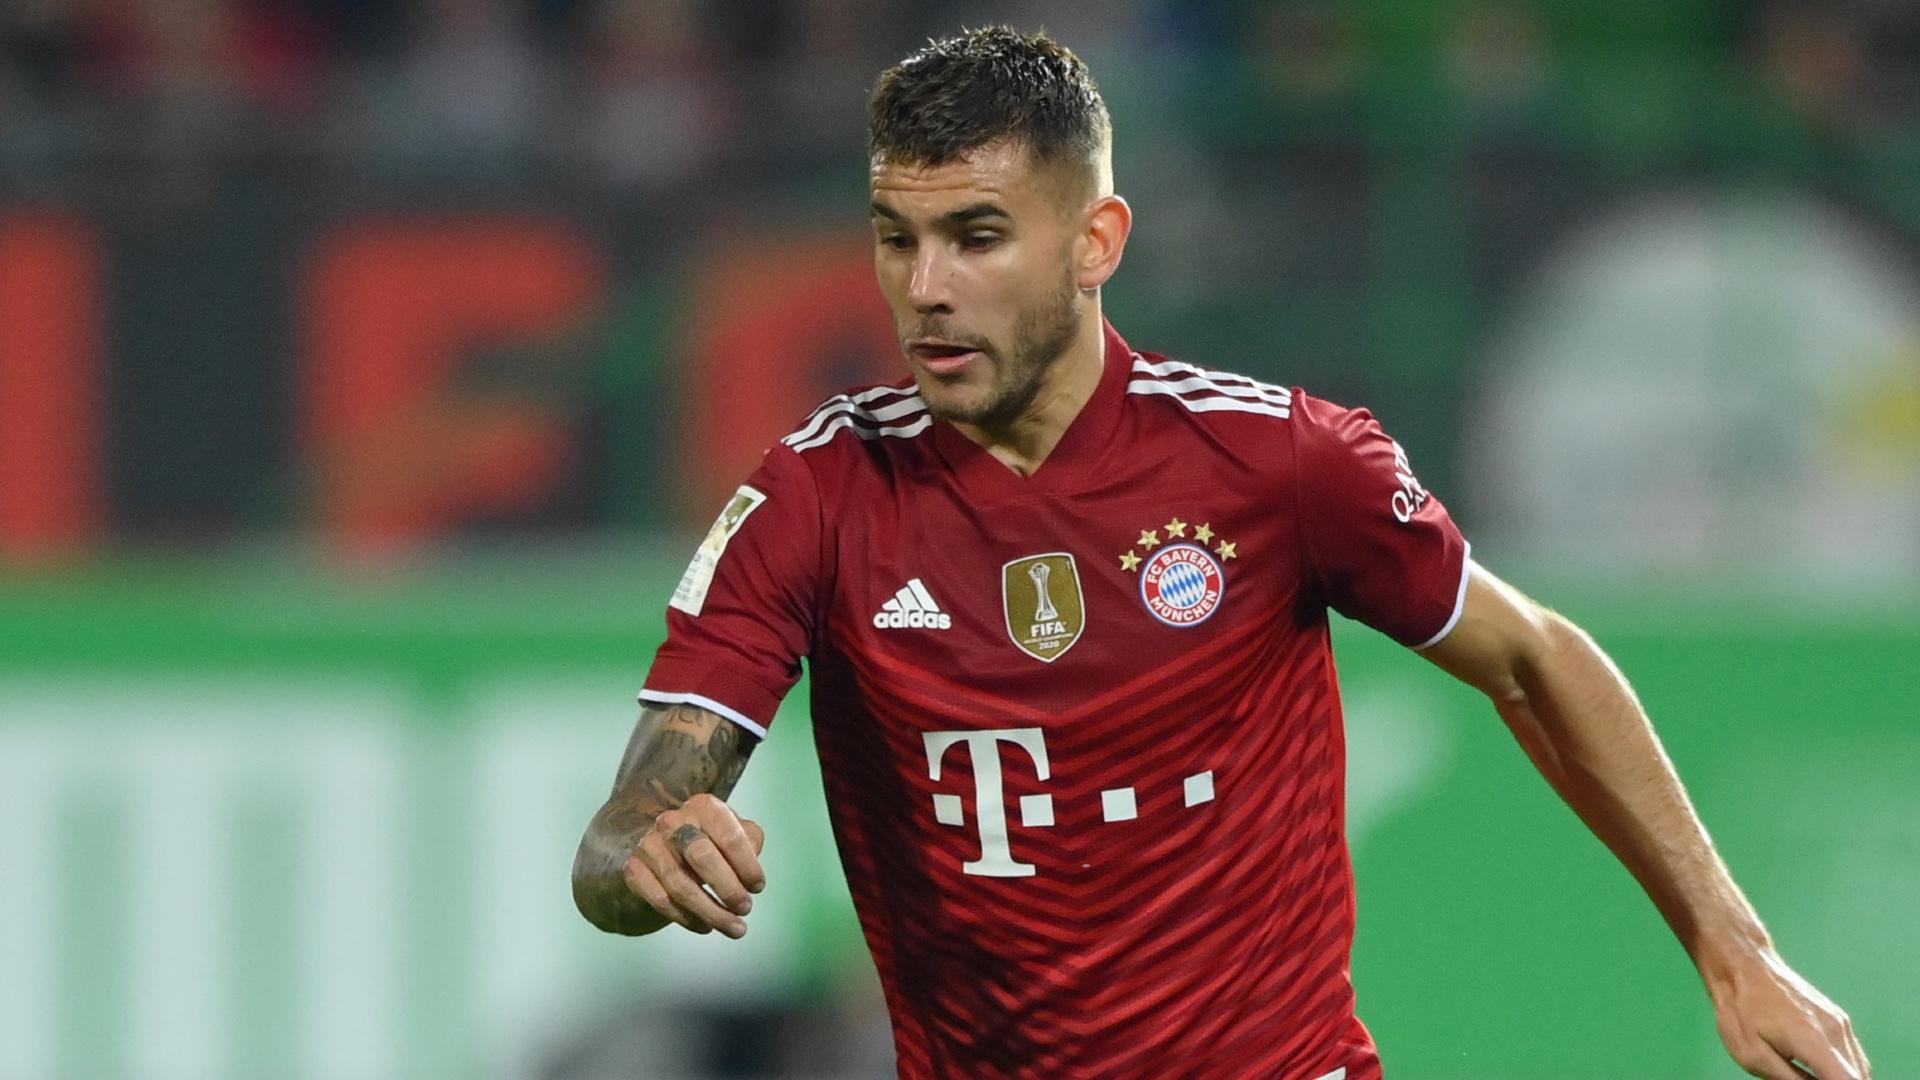 Bayern and France star Hernandez avoids jail sentence for violating restraining order